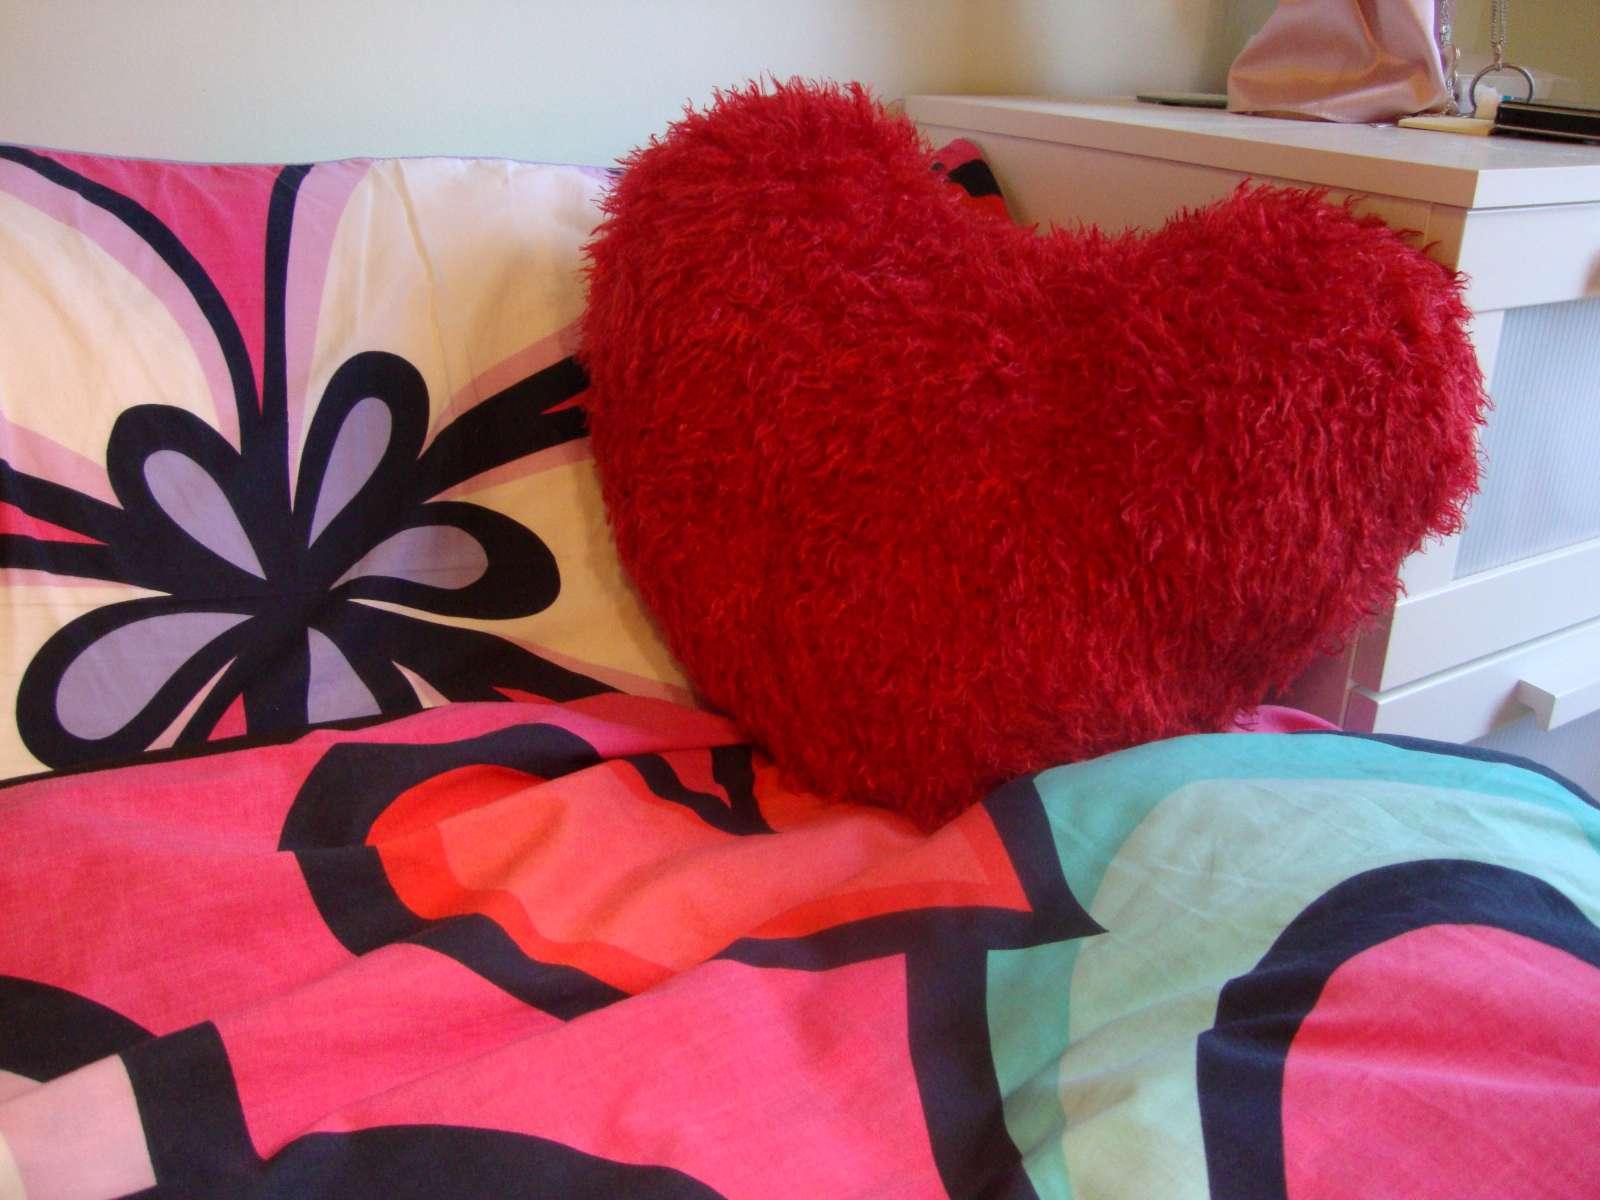 Knitting Pattern Heart Shaped Cushion : One Girl, One Quest: Knitting pattern: Heart shaped cushion